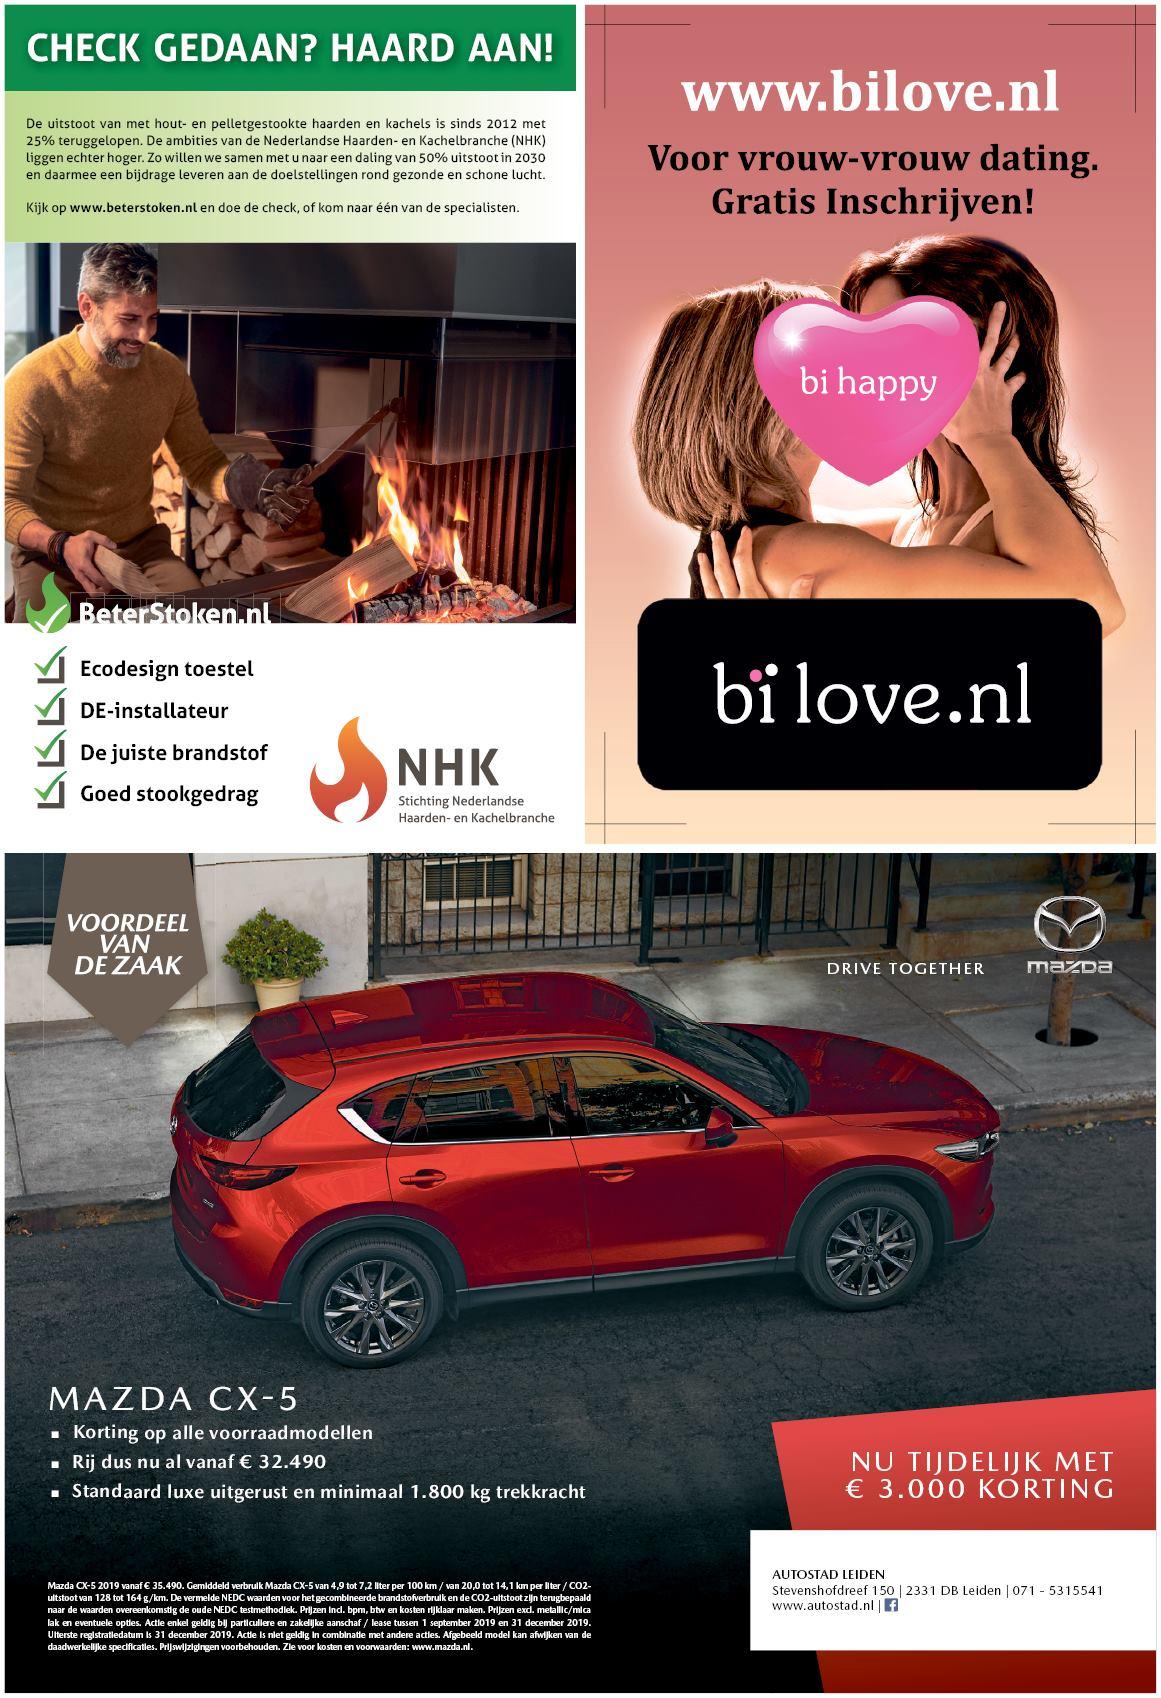 spanning dating Sims Online meest populaire dating site Filipijnen